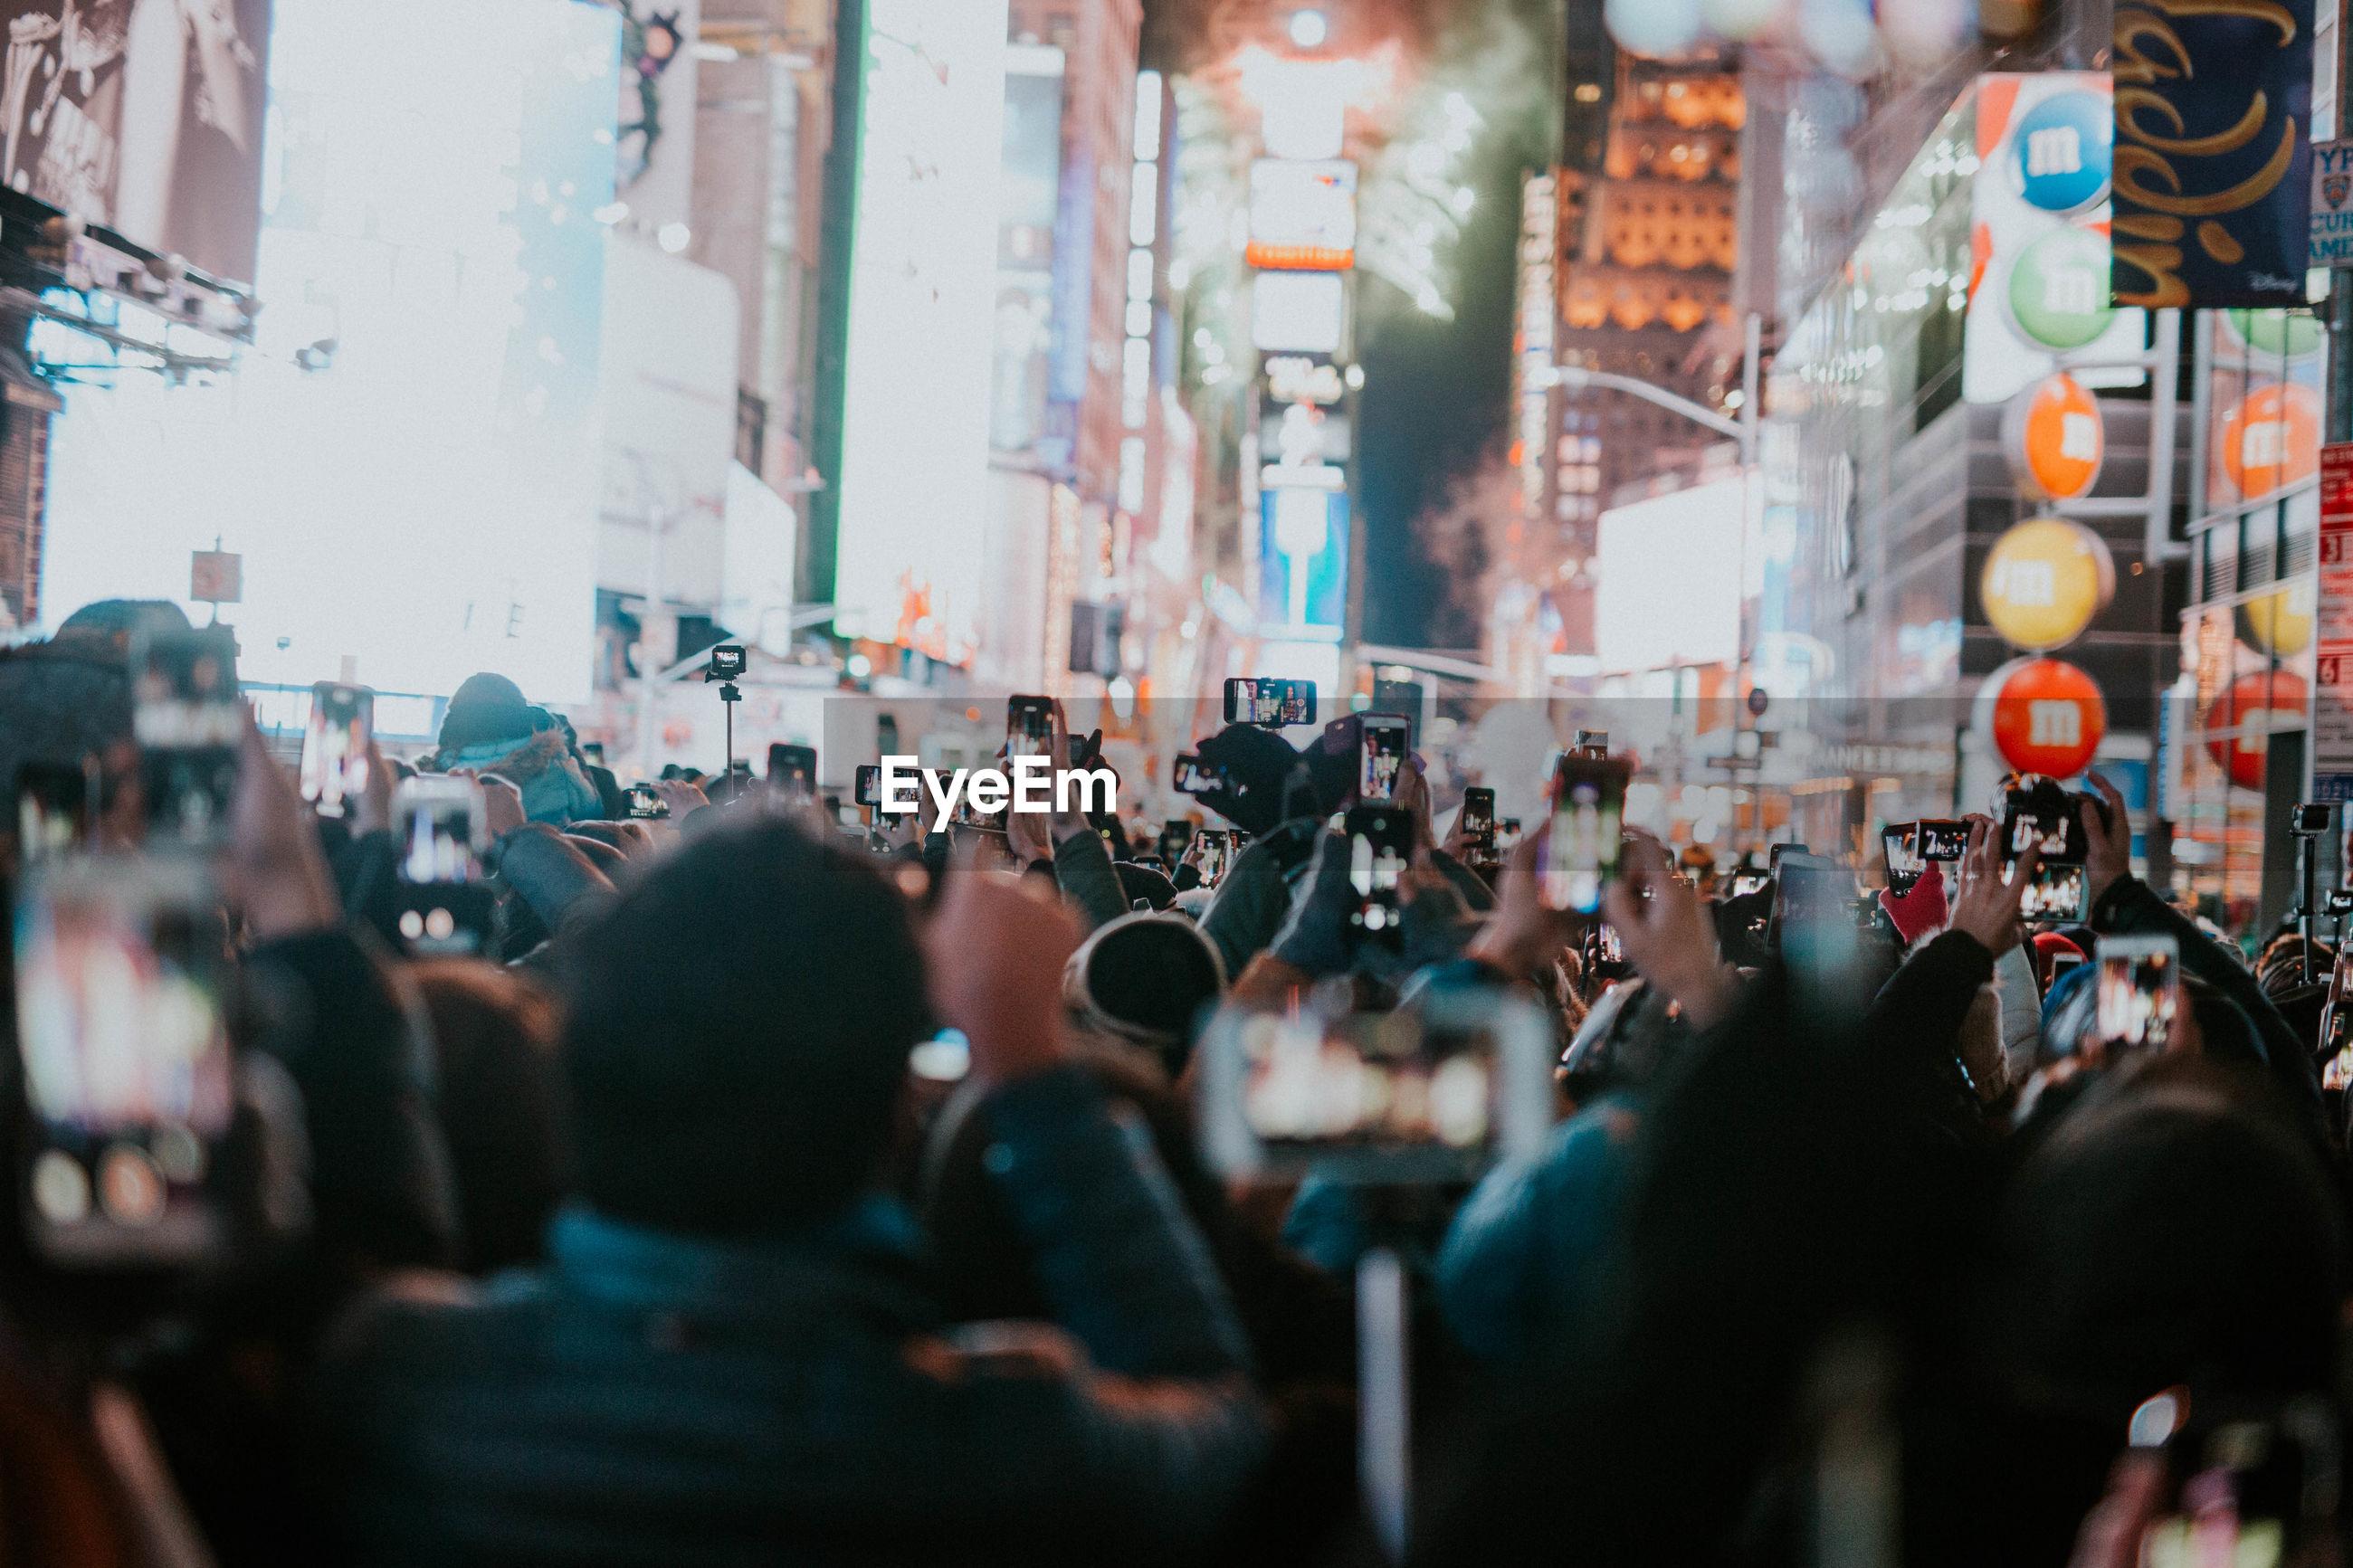 Crowd photographing on illuminated street at night